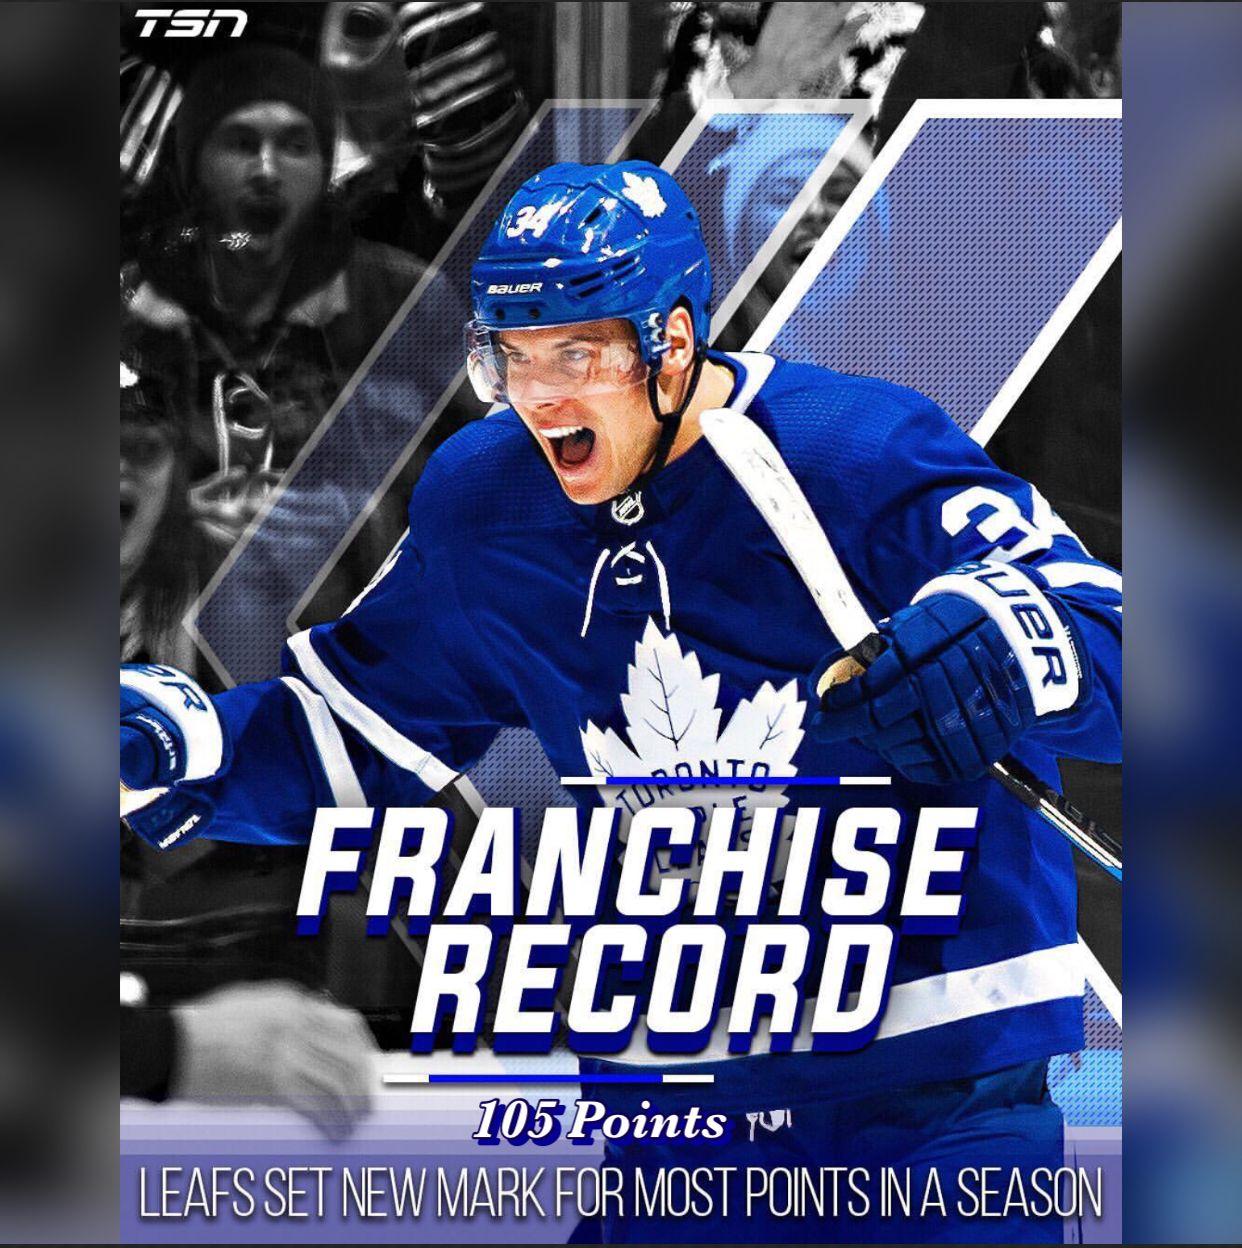 April 7, 2018 Toronto maple leafs hockey, Toronto maple